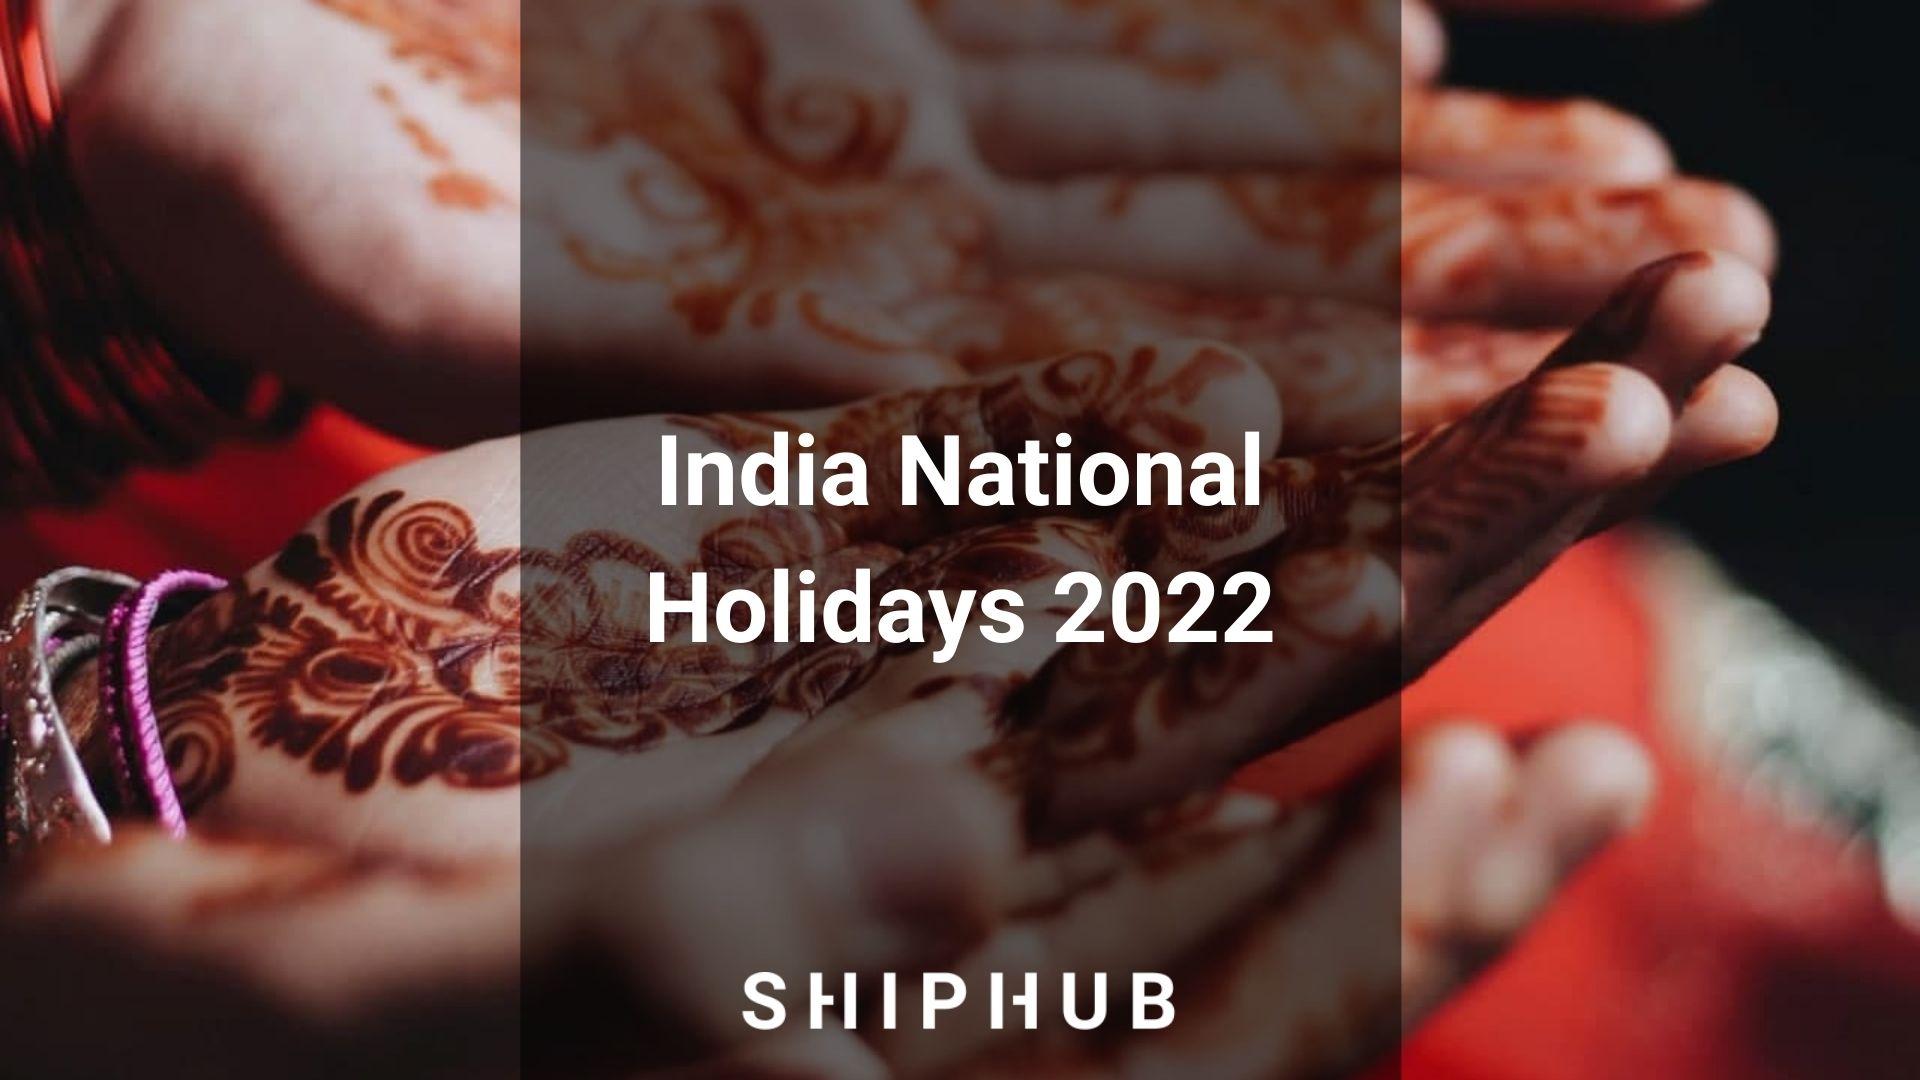 National Calendar 2022.India National Holidays 2022 2022 Calendar Shiphub